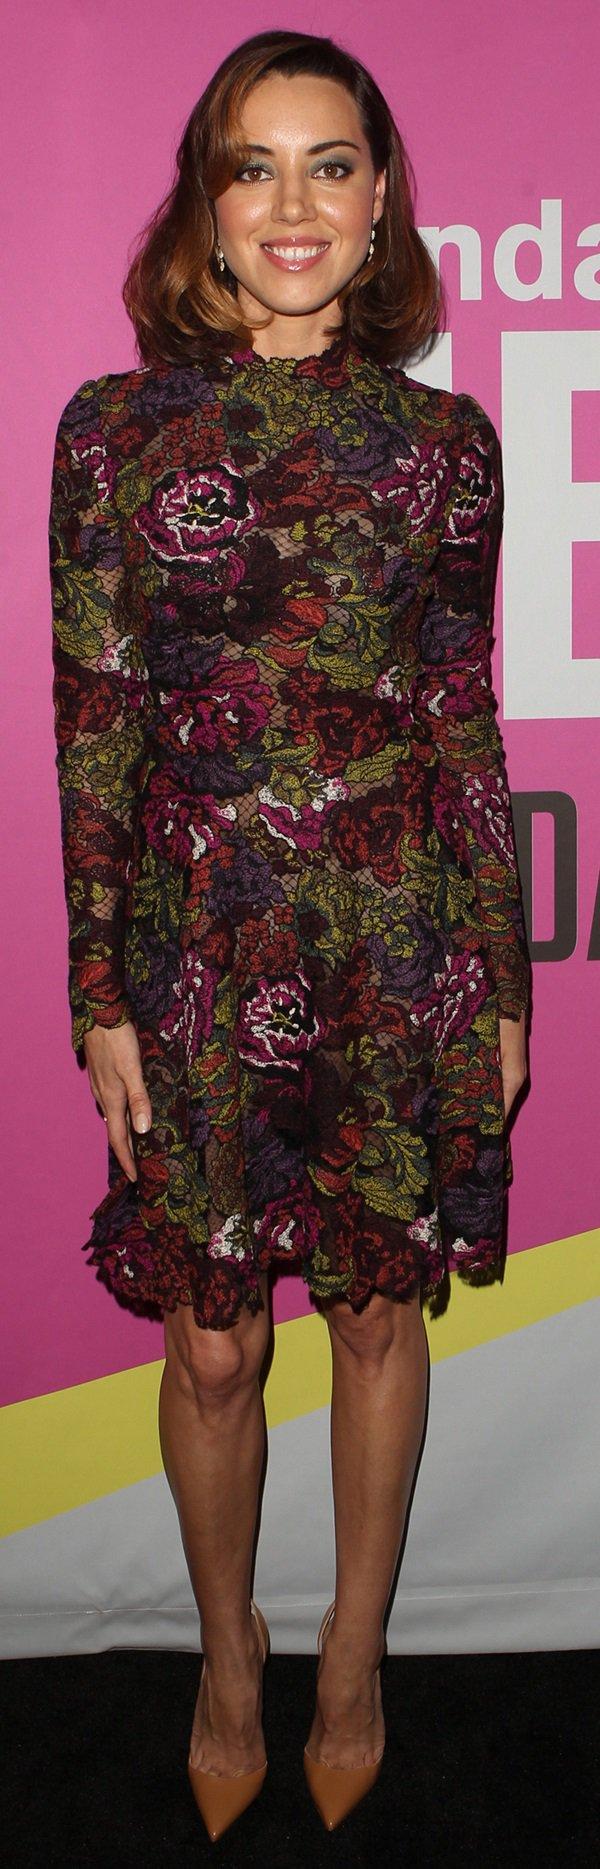 "Aubrey Plaza wearing a floral lace Valentino dress and tan Christian Louboutin ""Iriza"" pumps"